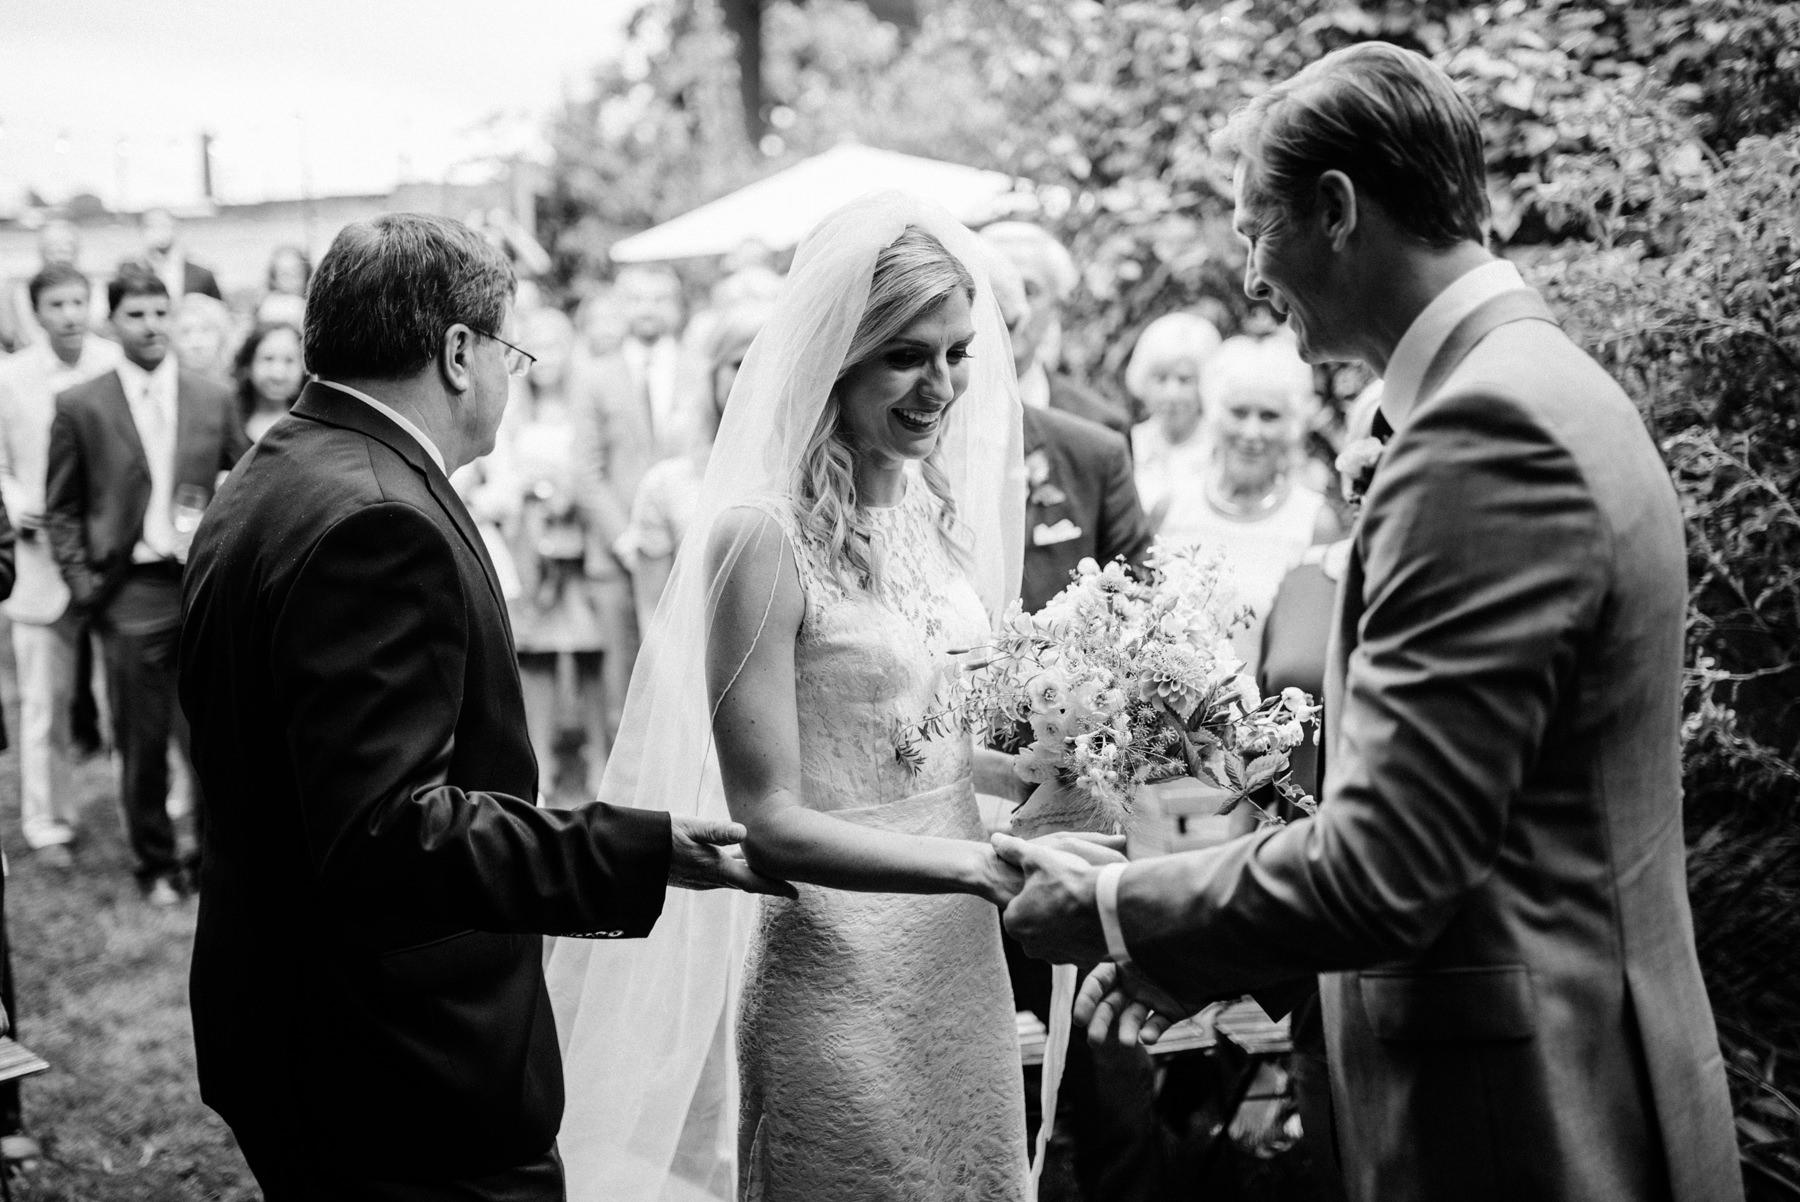 204-outdoor-wedding-ceremony-at-the-corson-building.jpg